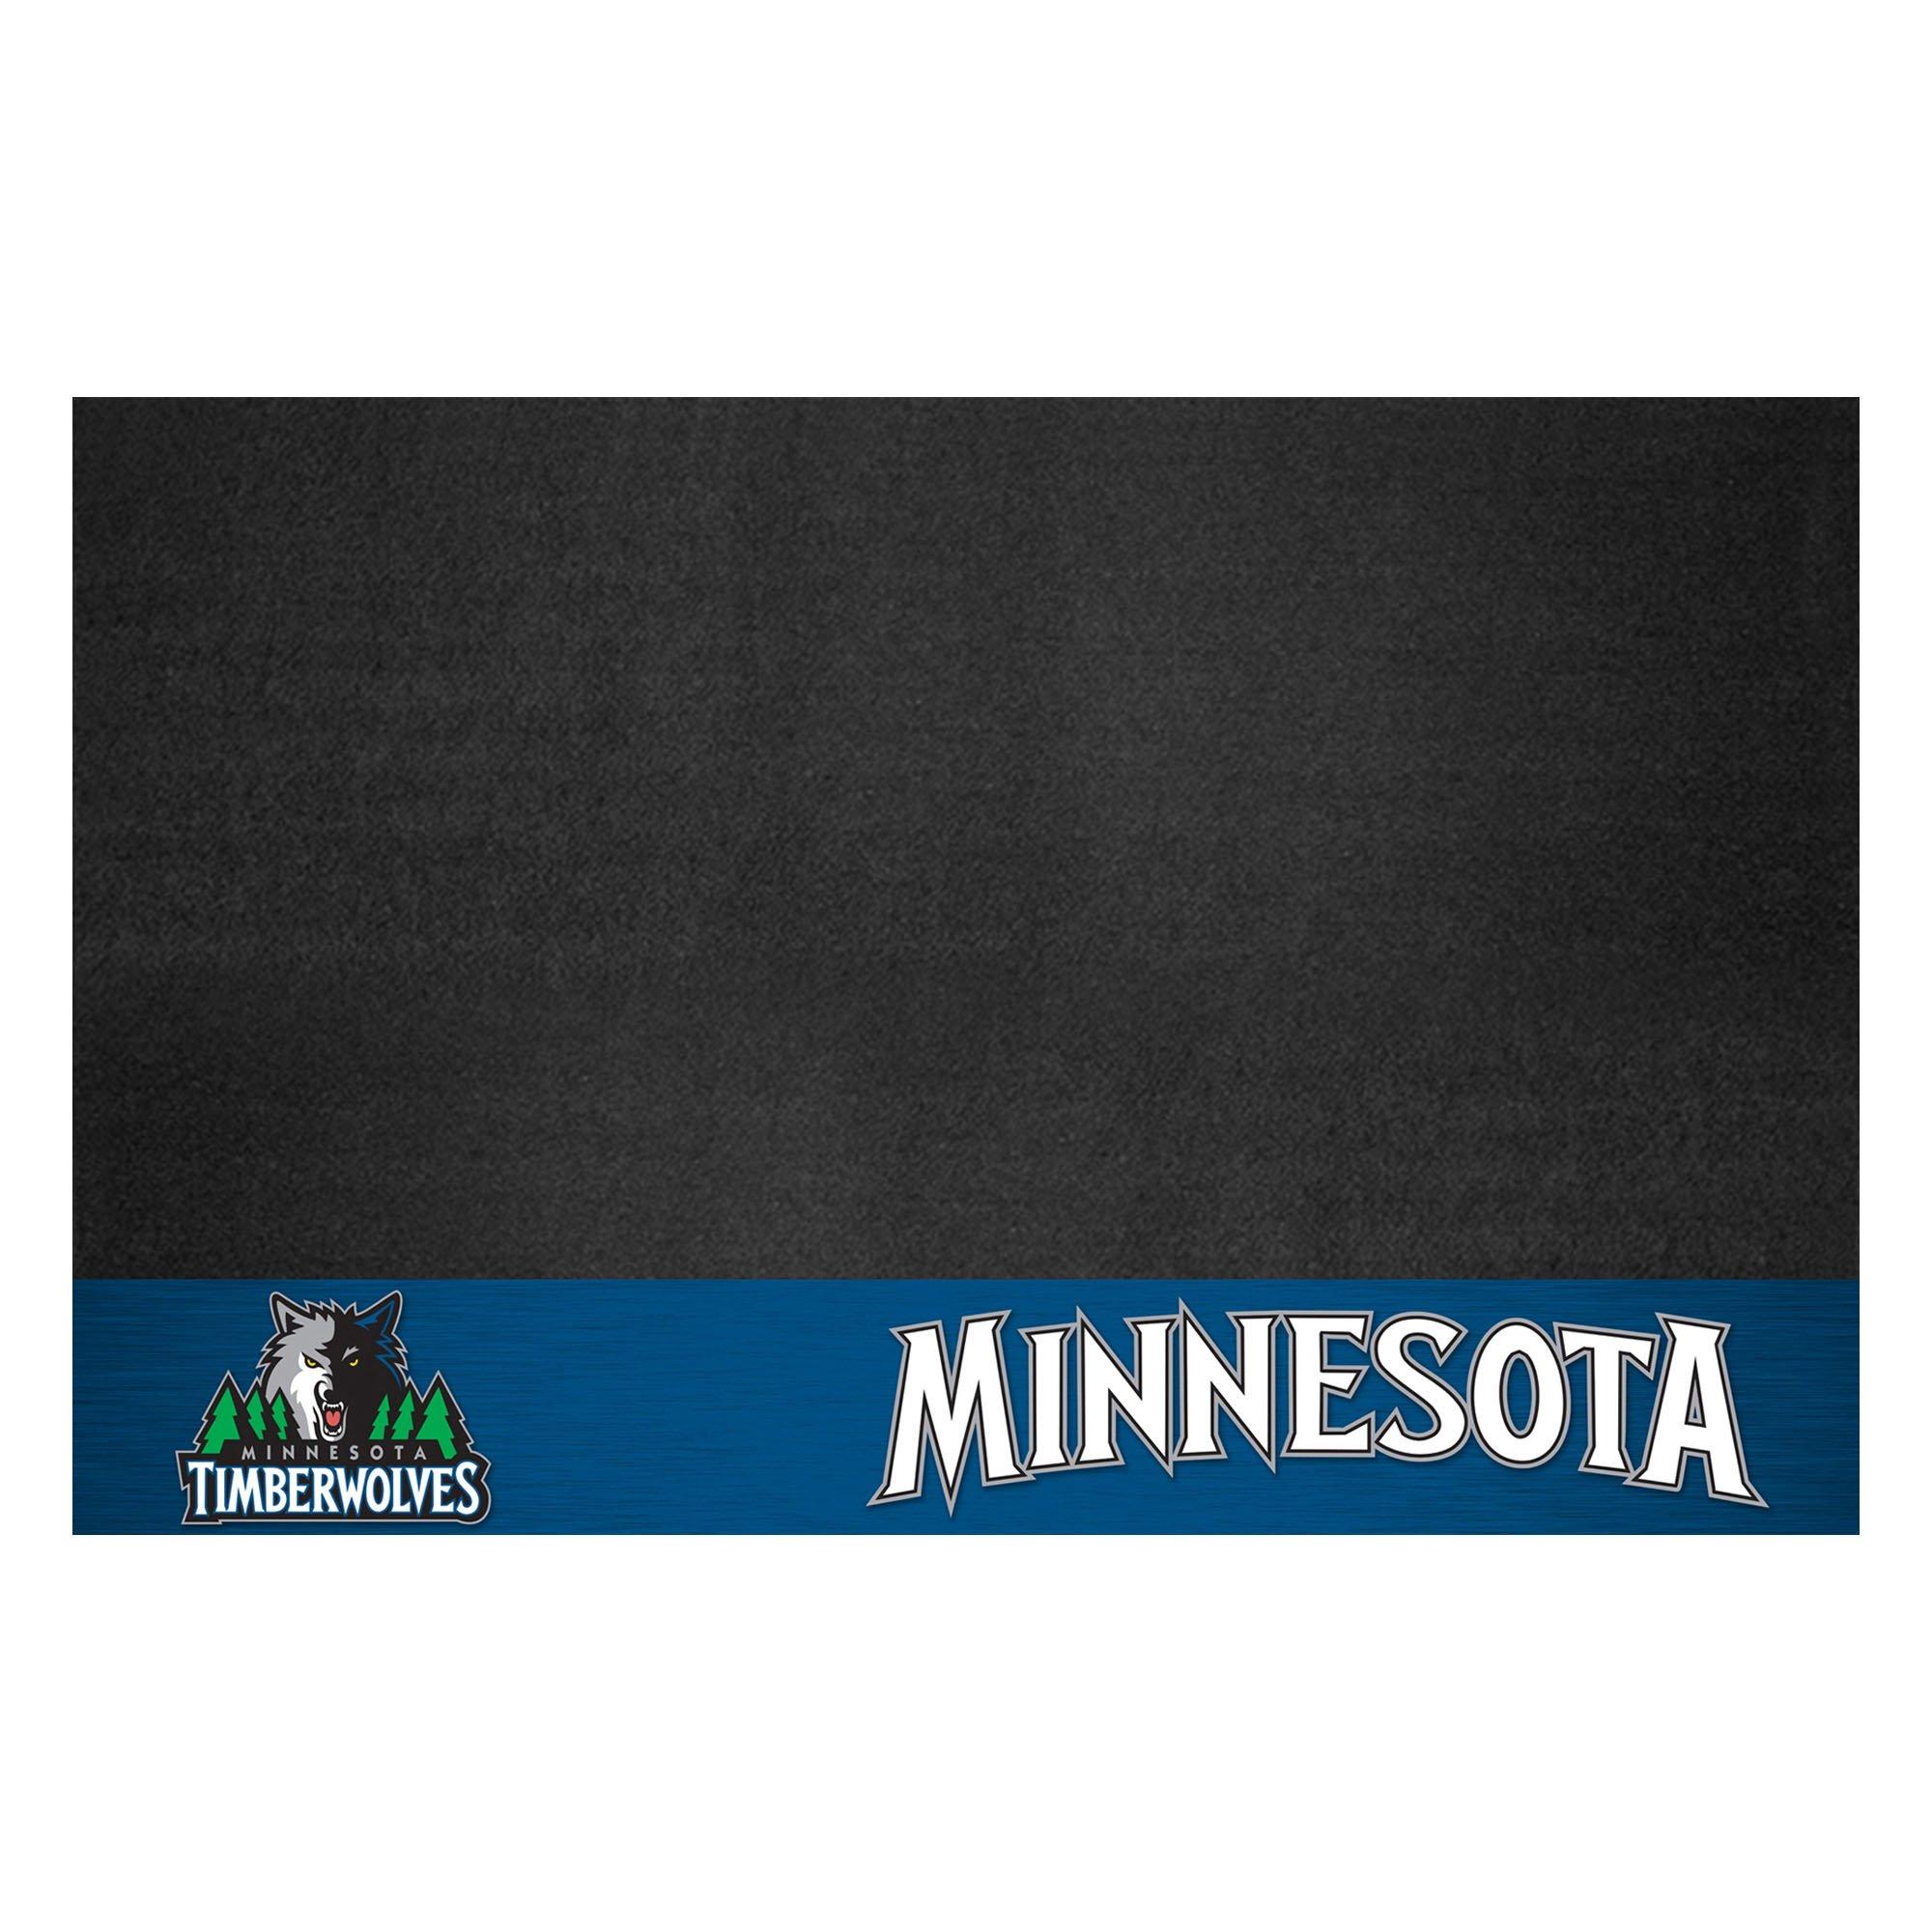 FANMATS 14212 NBA Minnesota Timberwolves Grill Mat